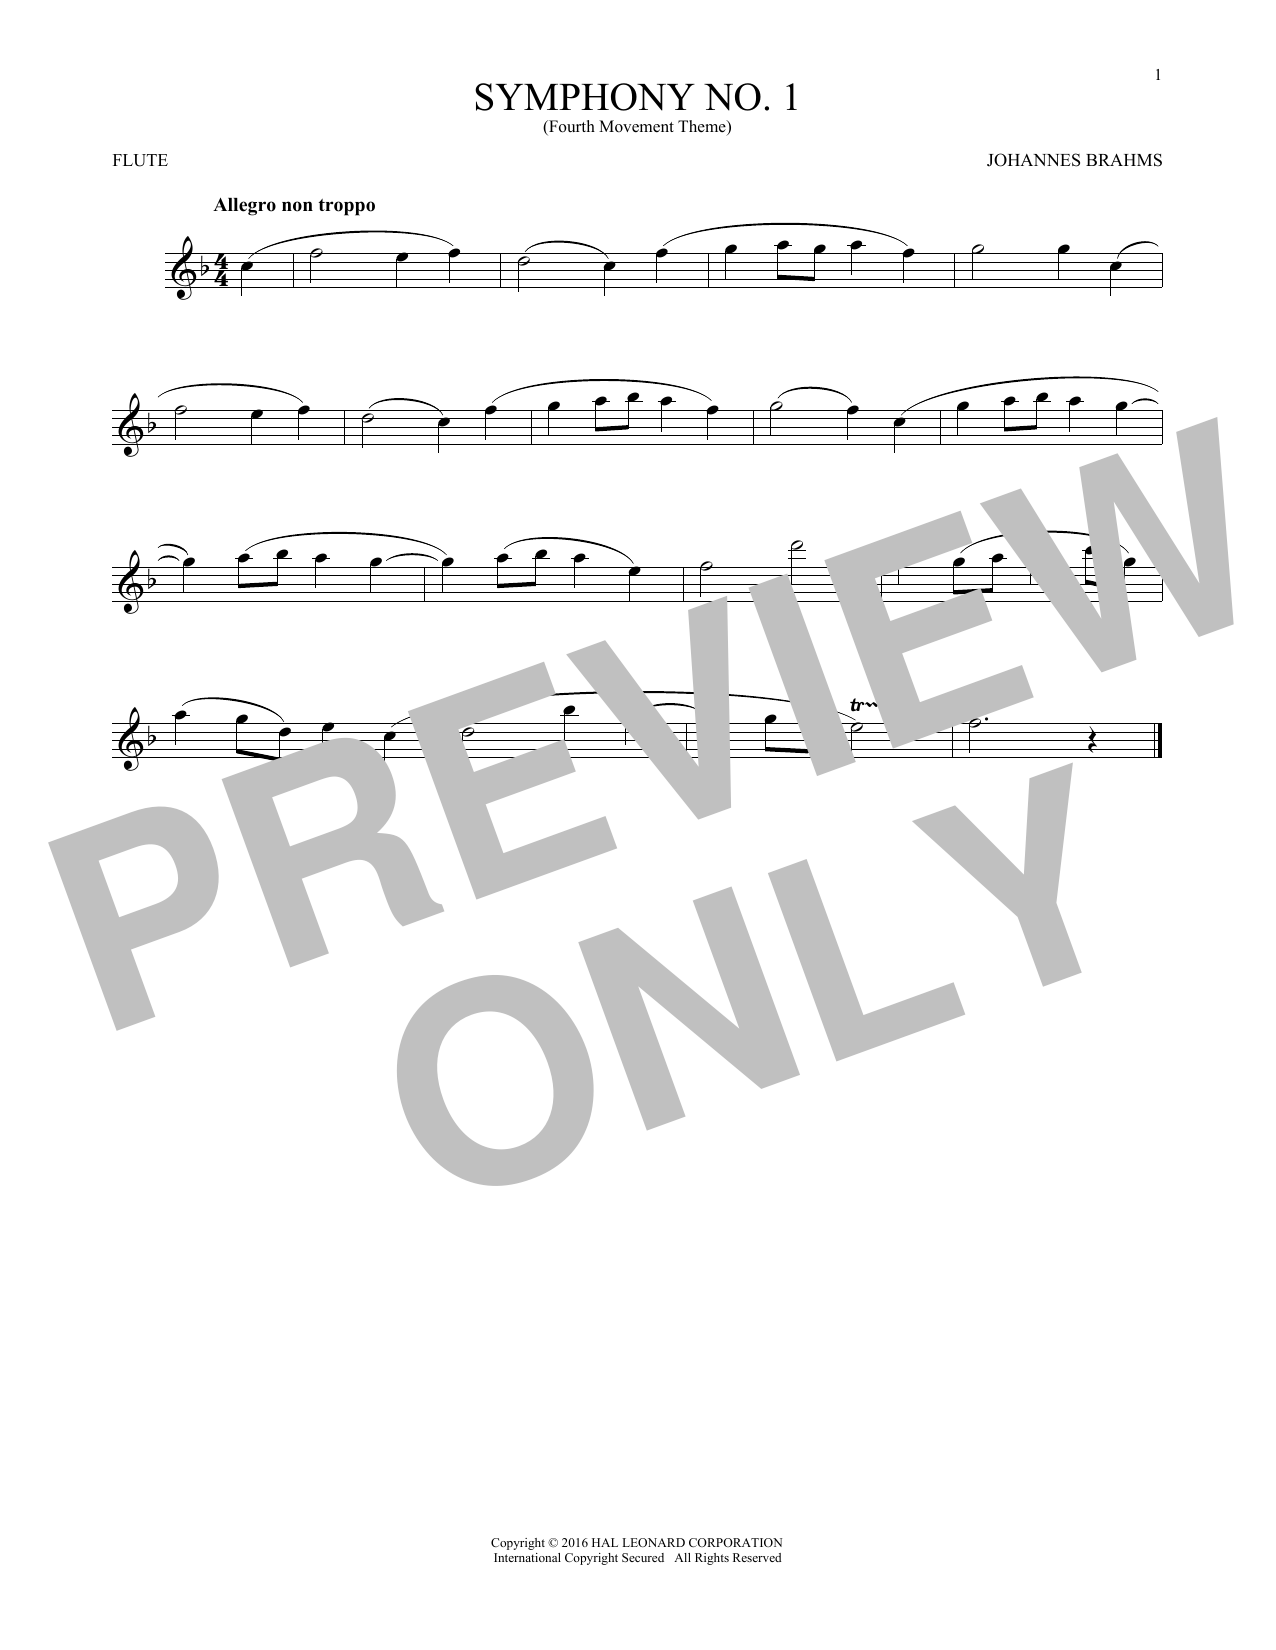 Symphony No. 1 In C Minor, Fourth Movement Excerpt (Flute Solo)